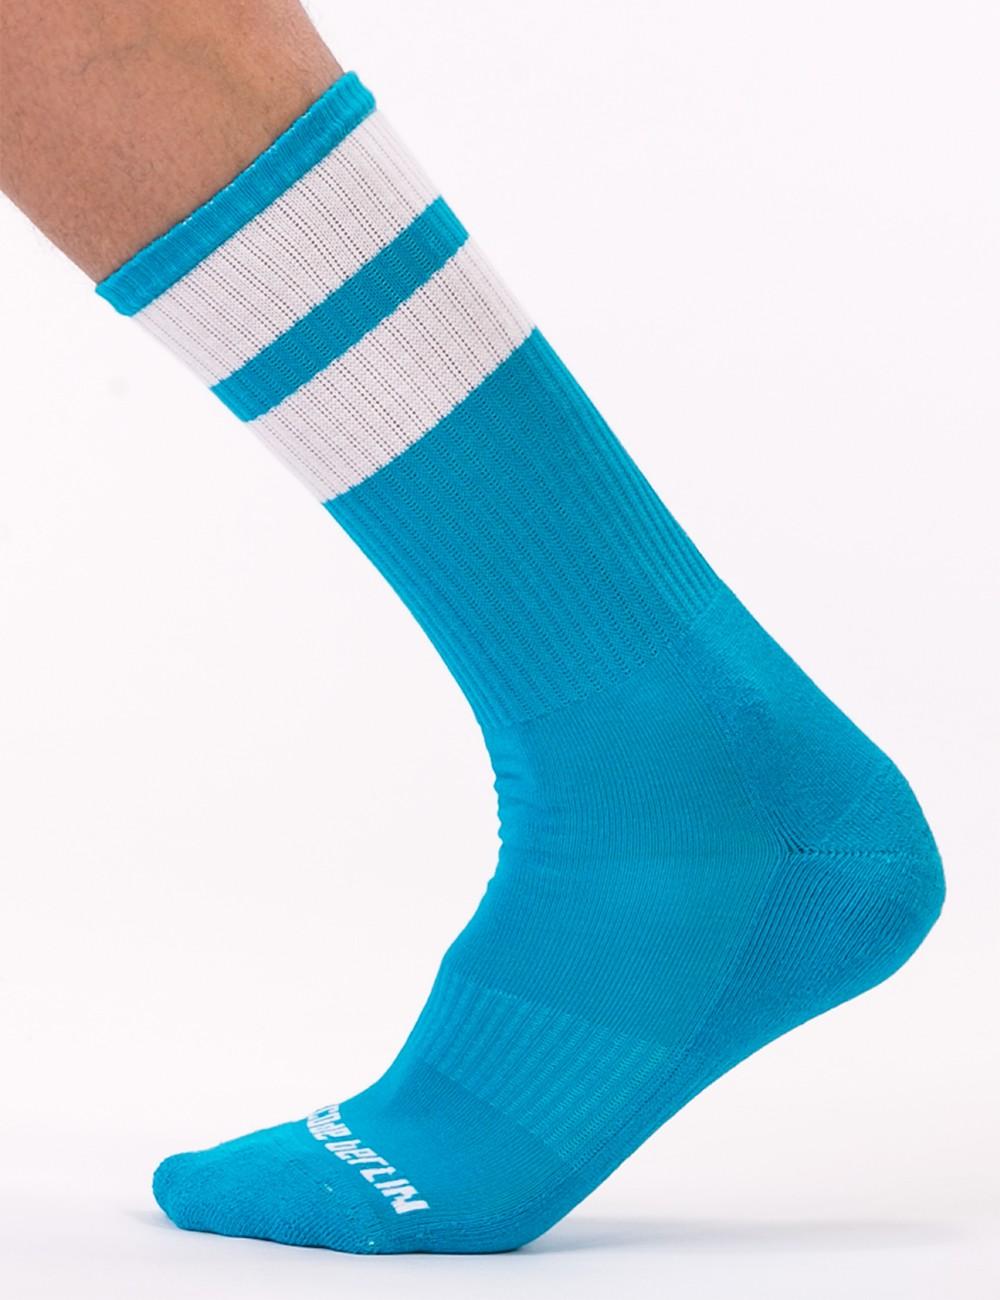 Gym Socks - Blue-White